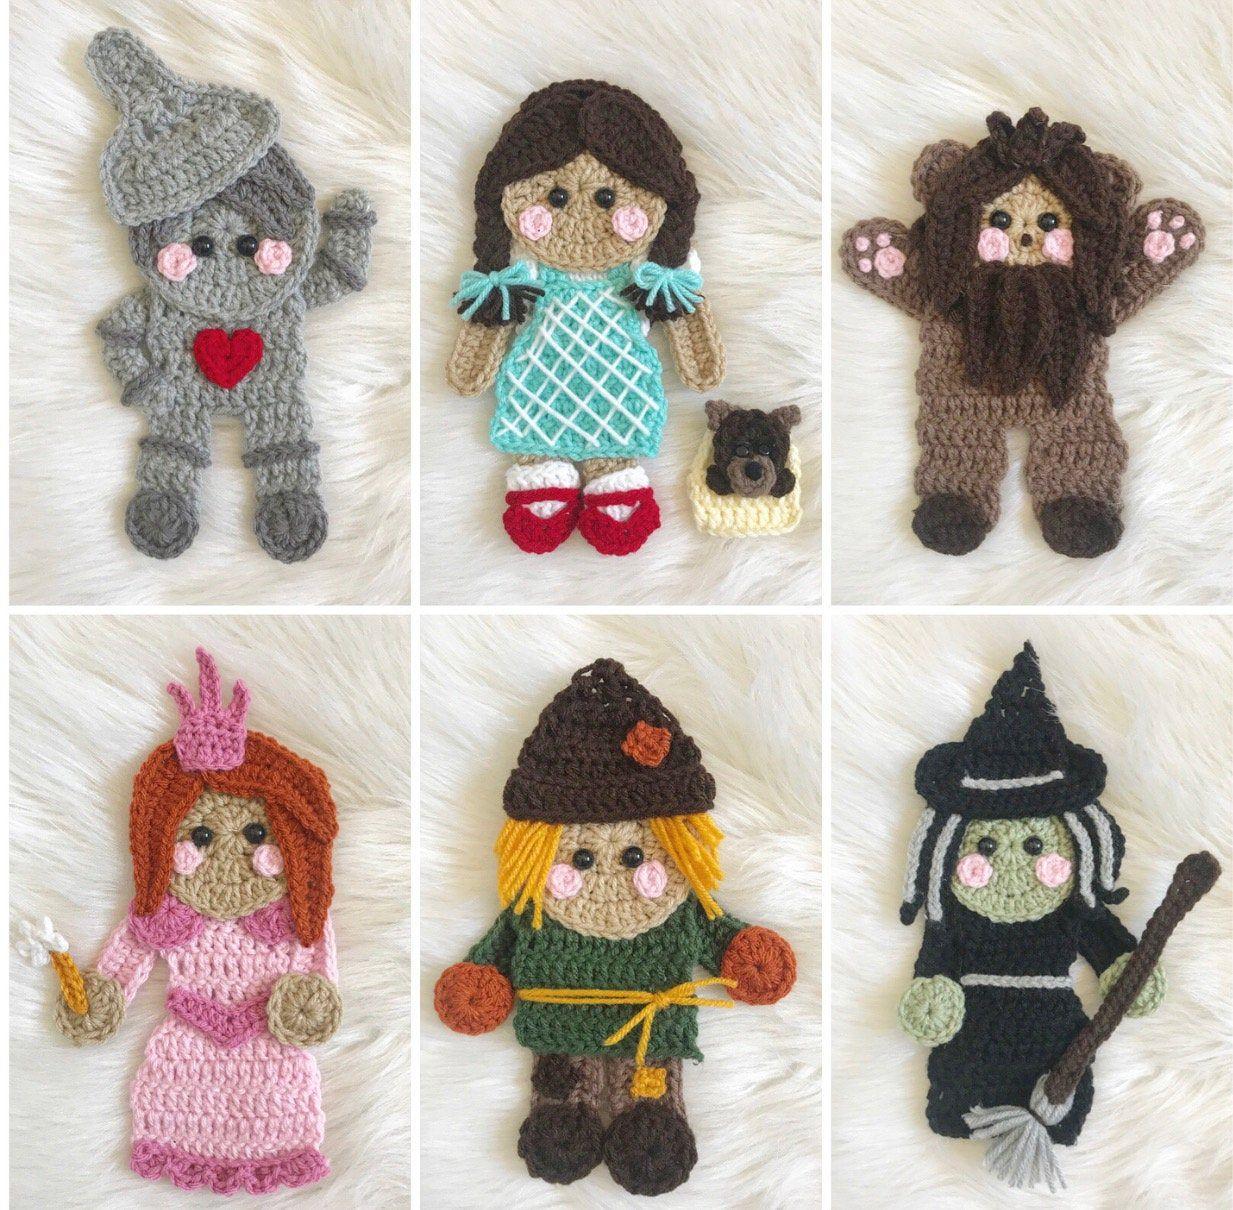 Crochet Pattern - INSTANT PDF DOWNLOAD - Nellas Cottage - Over The Rainbow - Crochet - Patterns - Crochet Patterns - Nellas Cottage Patterns #crochetdinosaurpatterns